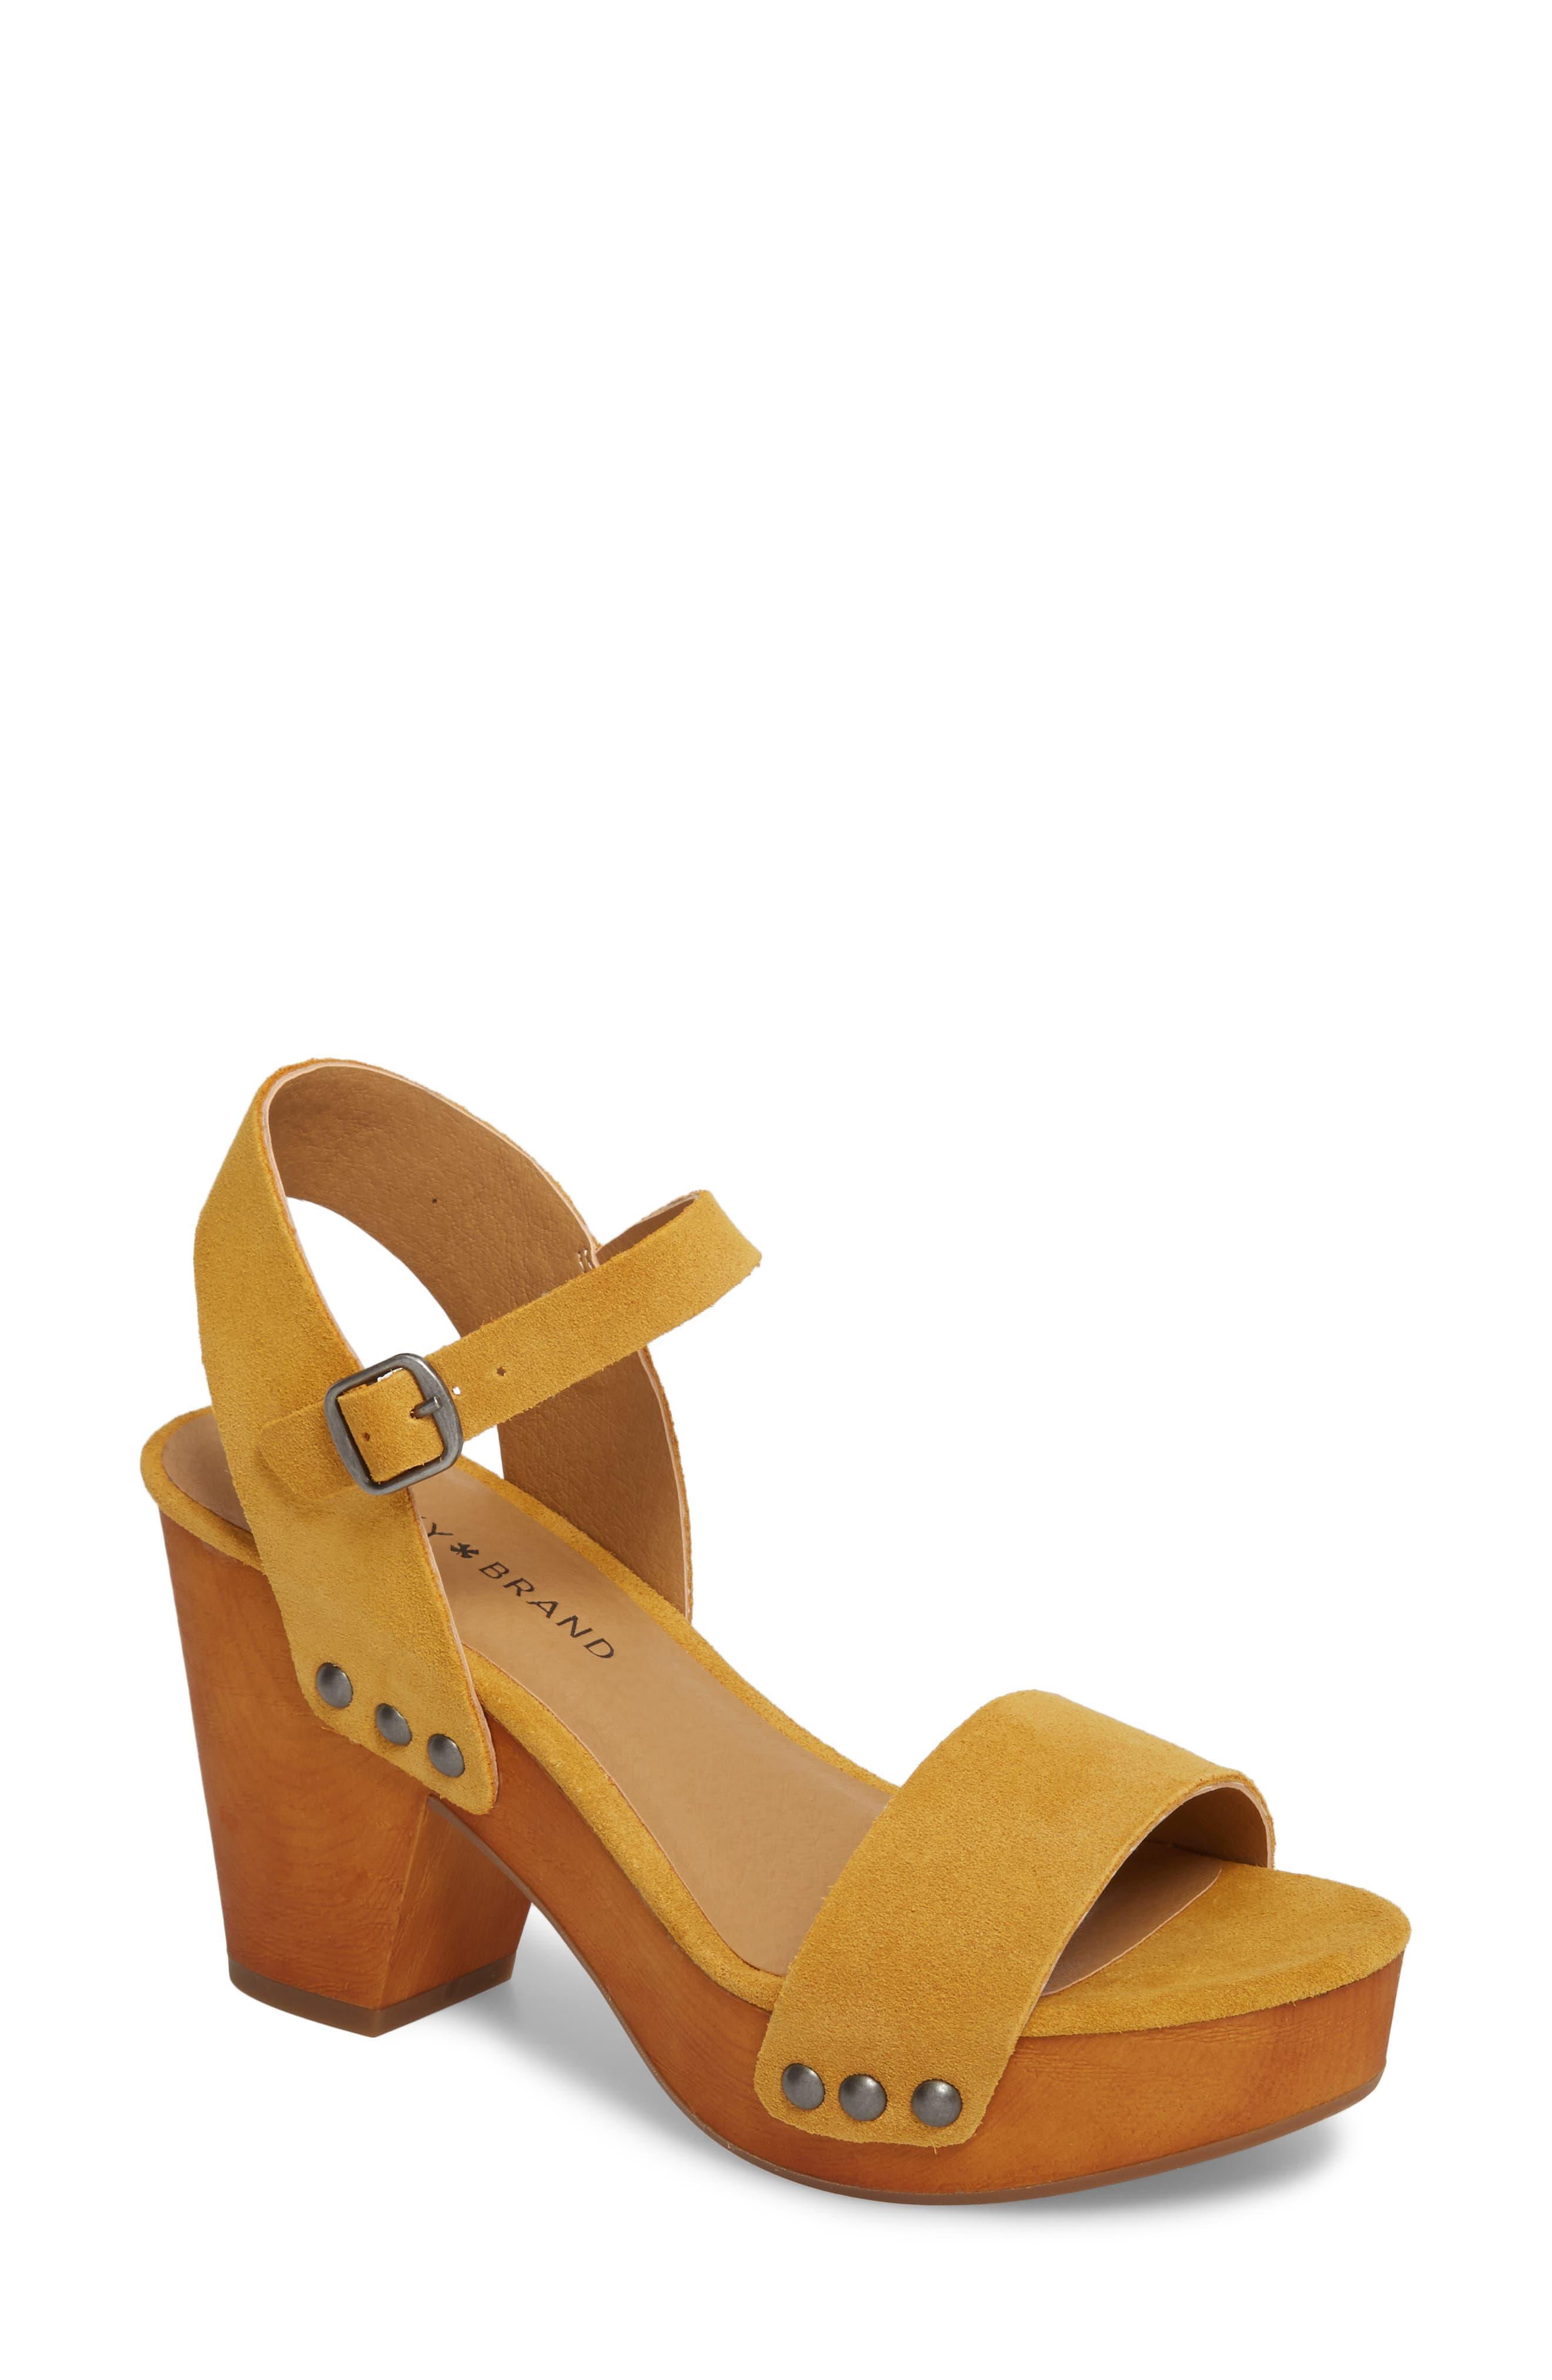 bef74ef2a07 Women s Sandals on SALE!  50 -  59.99